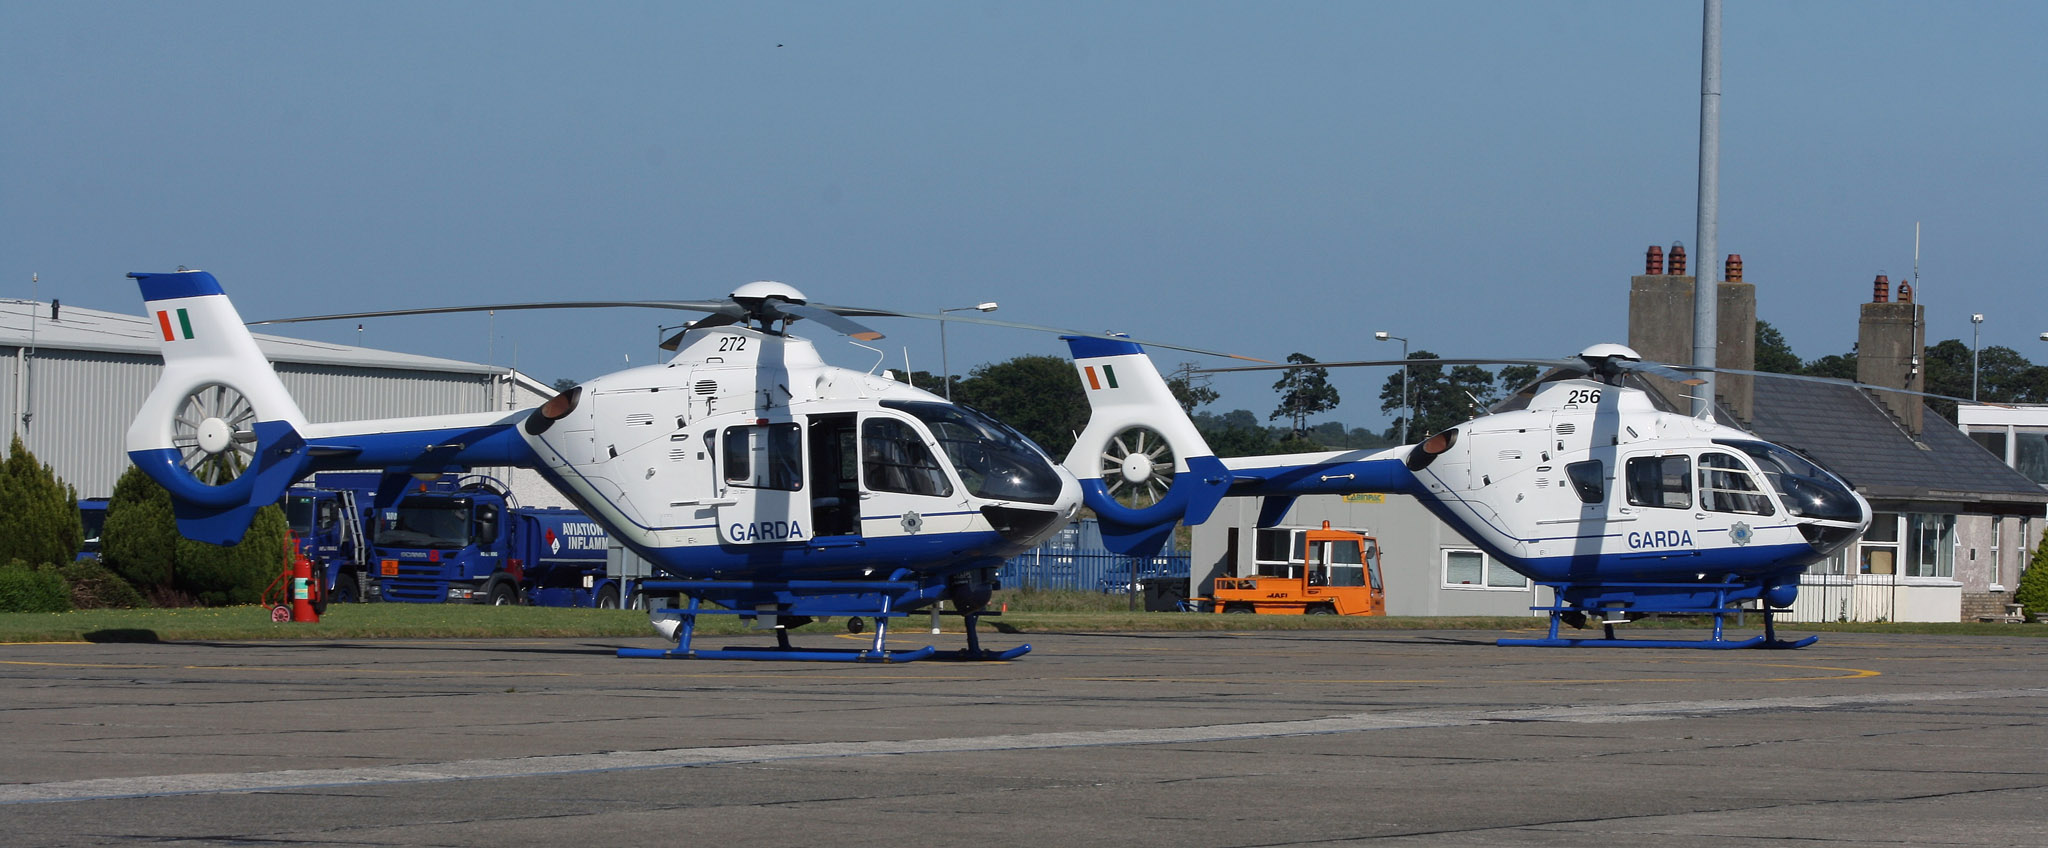 GASU EC-135 helicopters (IMG3895 JL)